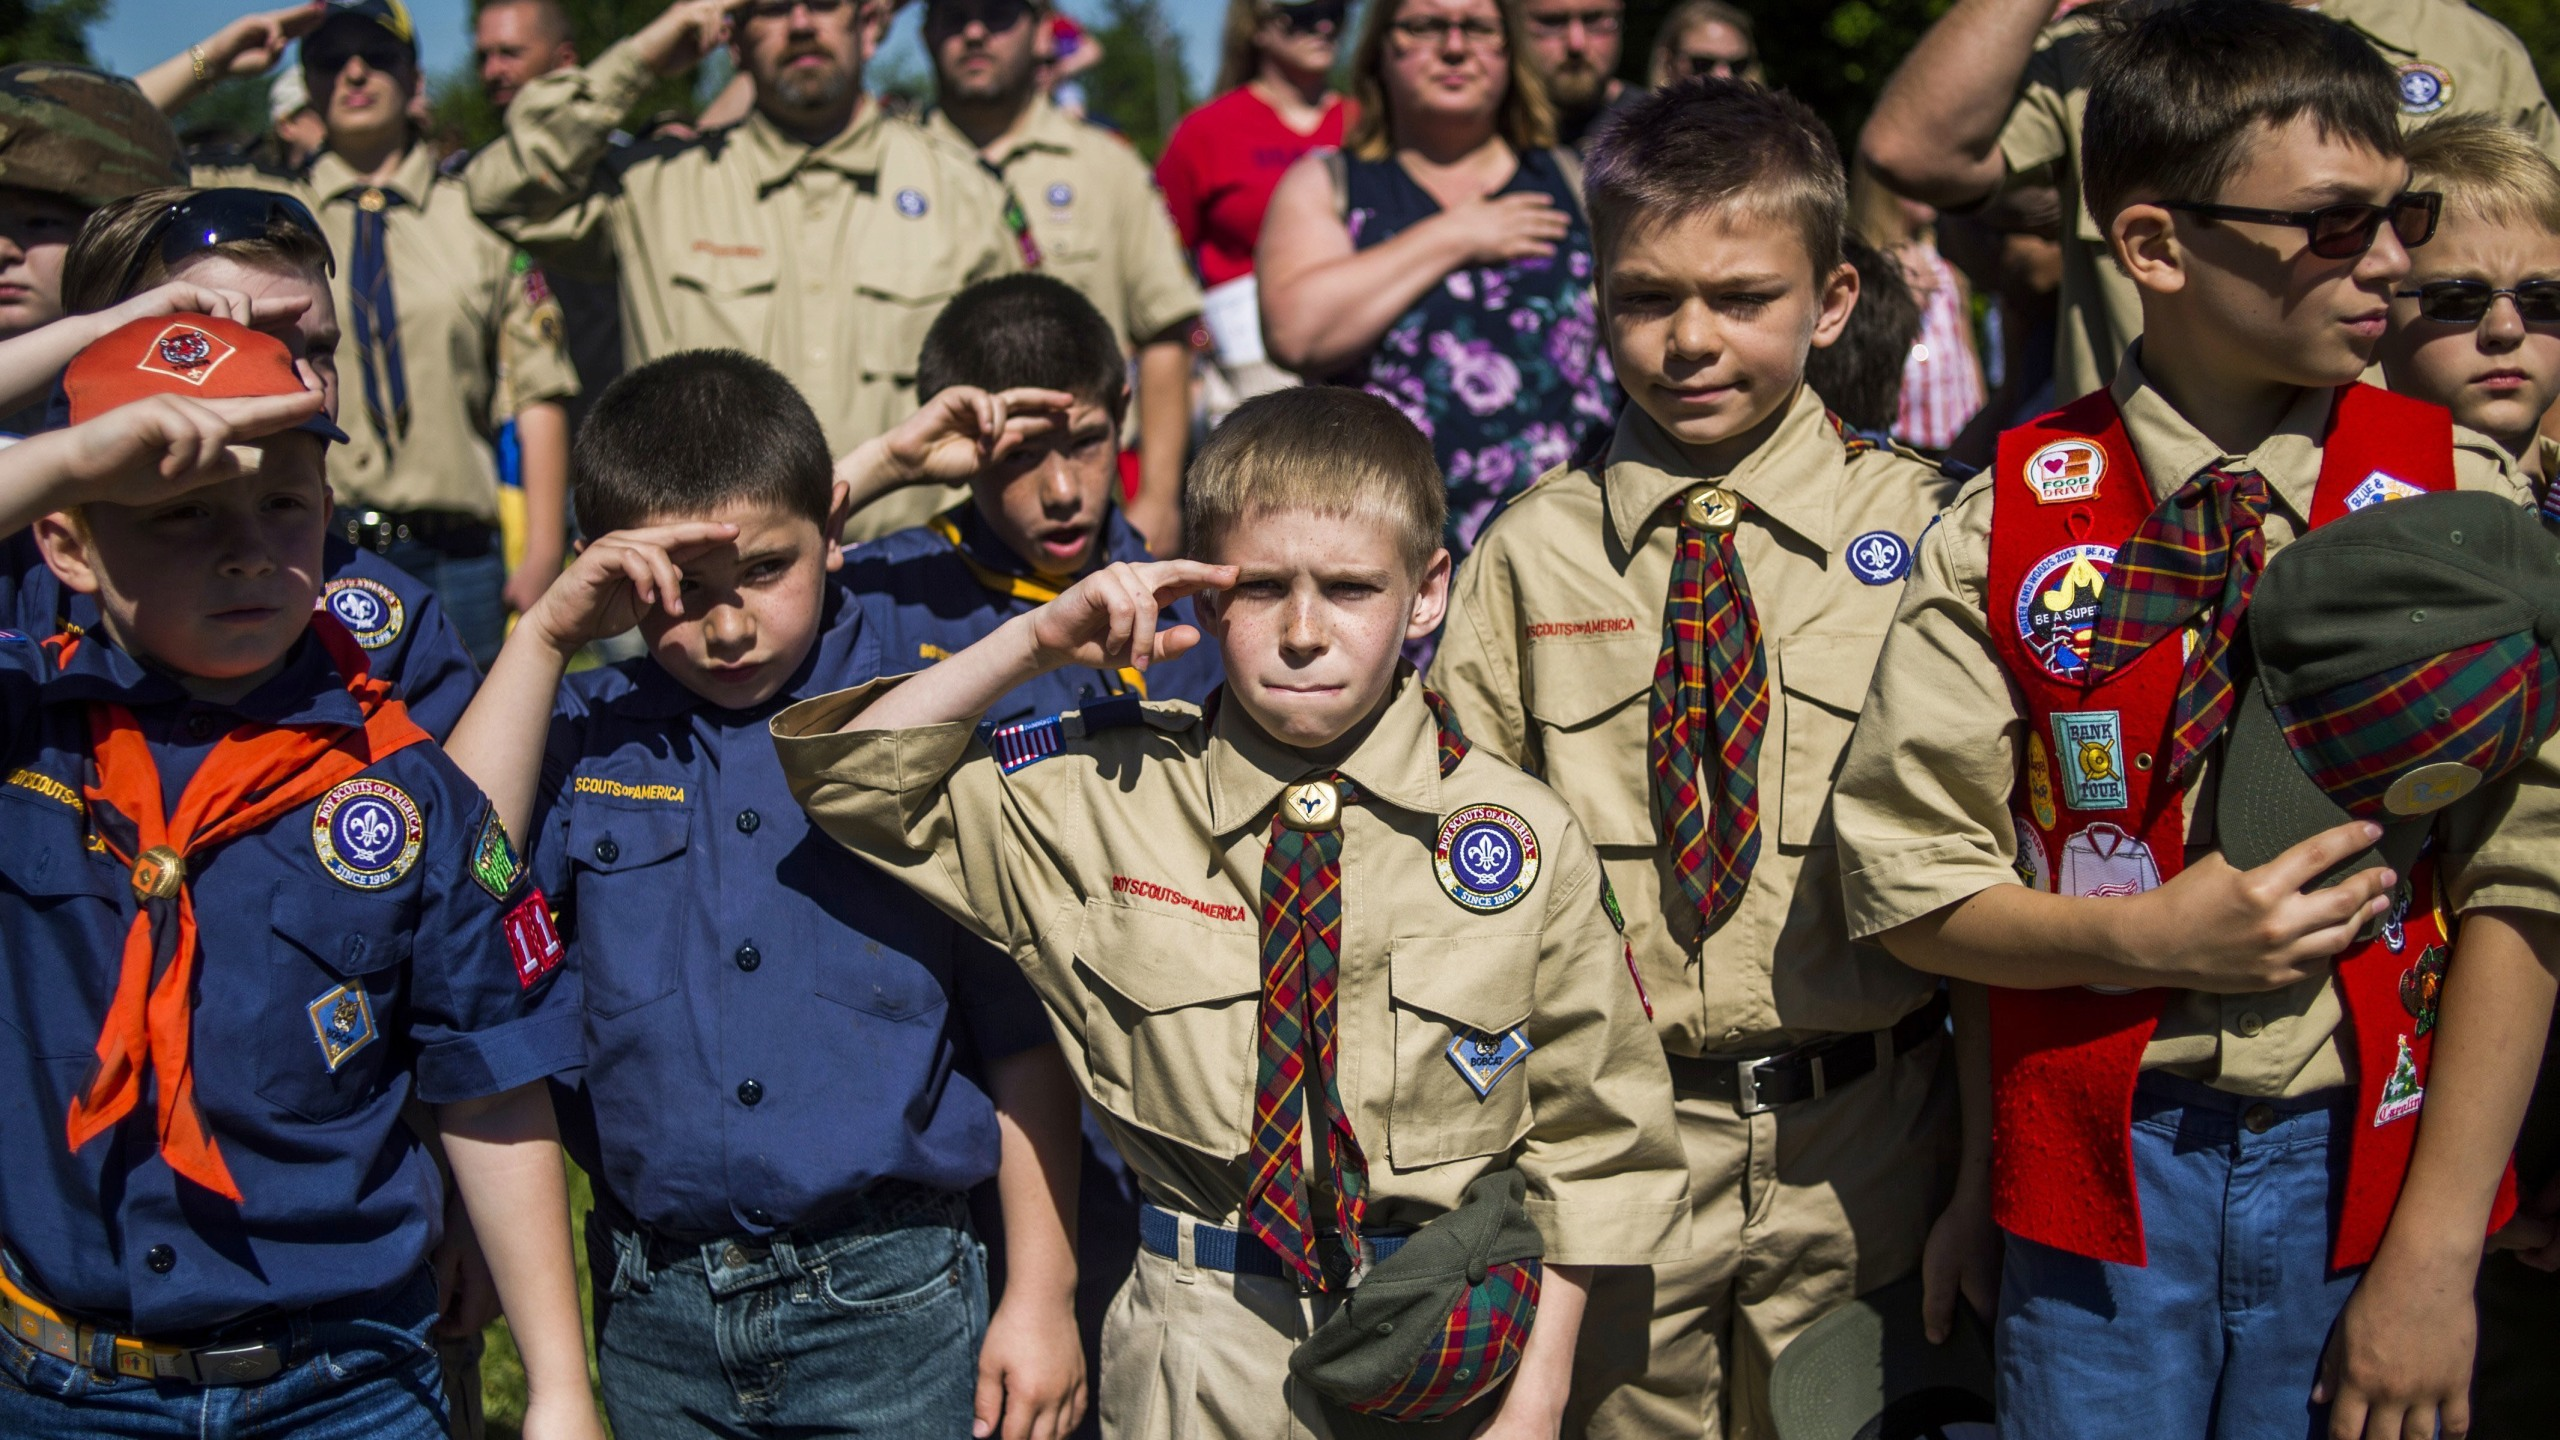 Boy Scouts Welcoming Girls_288954